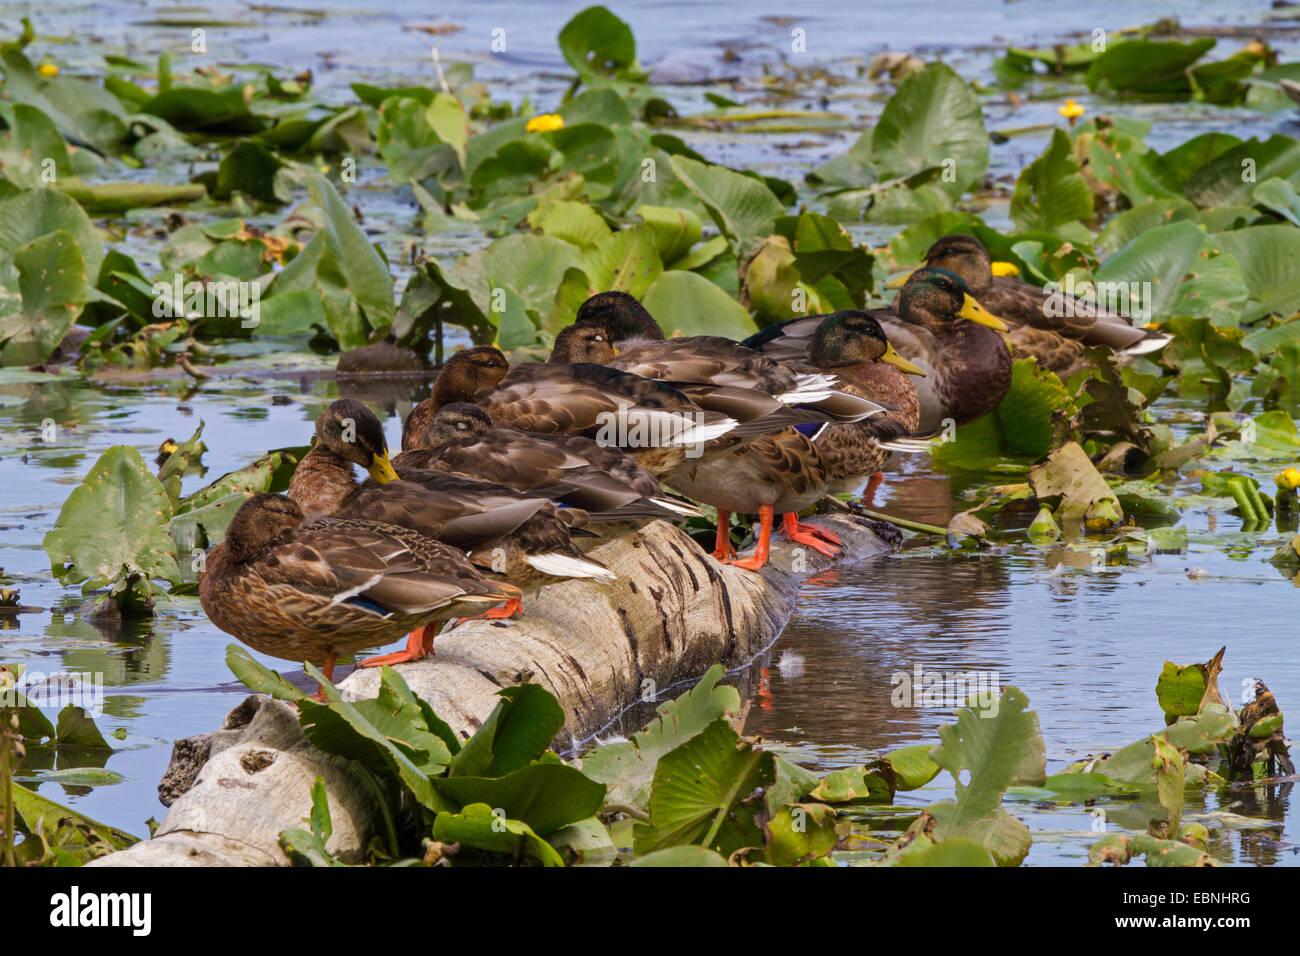 gadwall (Anas strepera, Mareca strepera), sleeping with mallards on driftwood, Germany, Bavaria, Lake Chiemsee - Stock Image